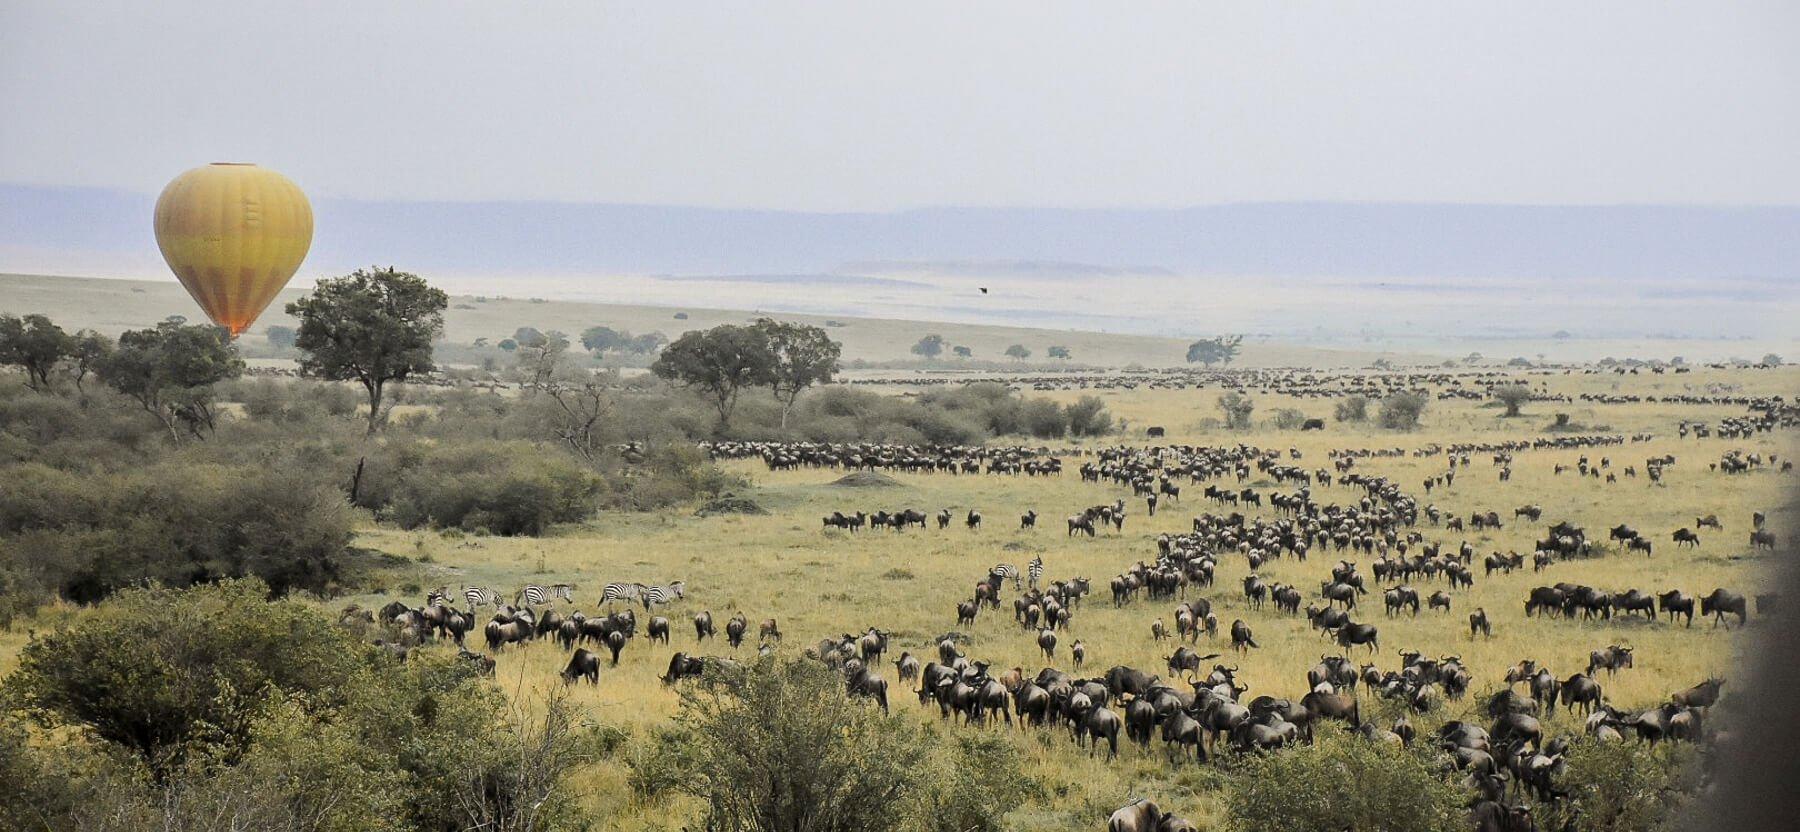 Wildebeest Migration over Maasai Mara Savanna